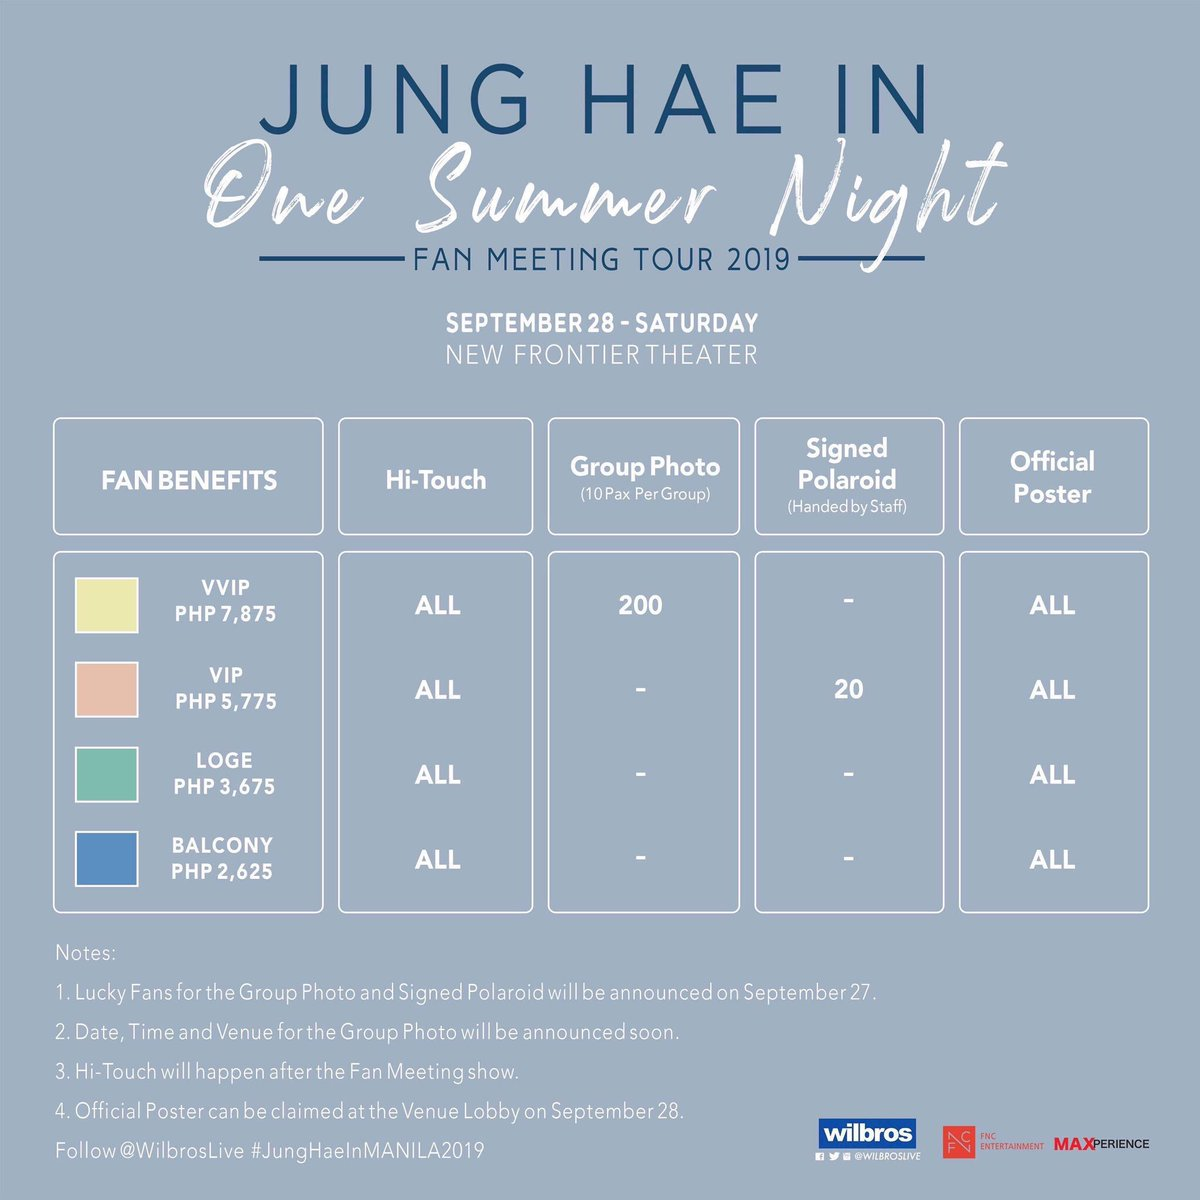 junghaein hashtag on Twitter